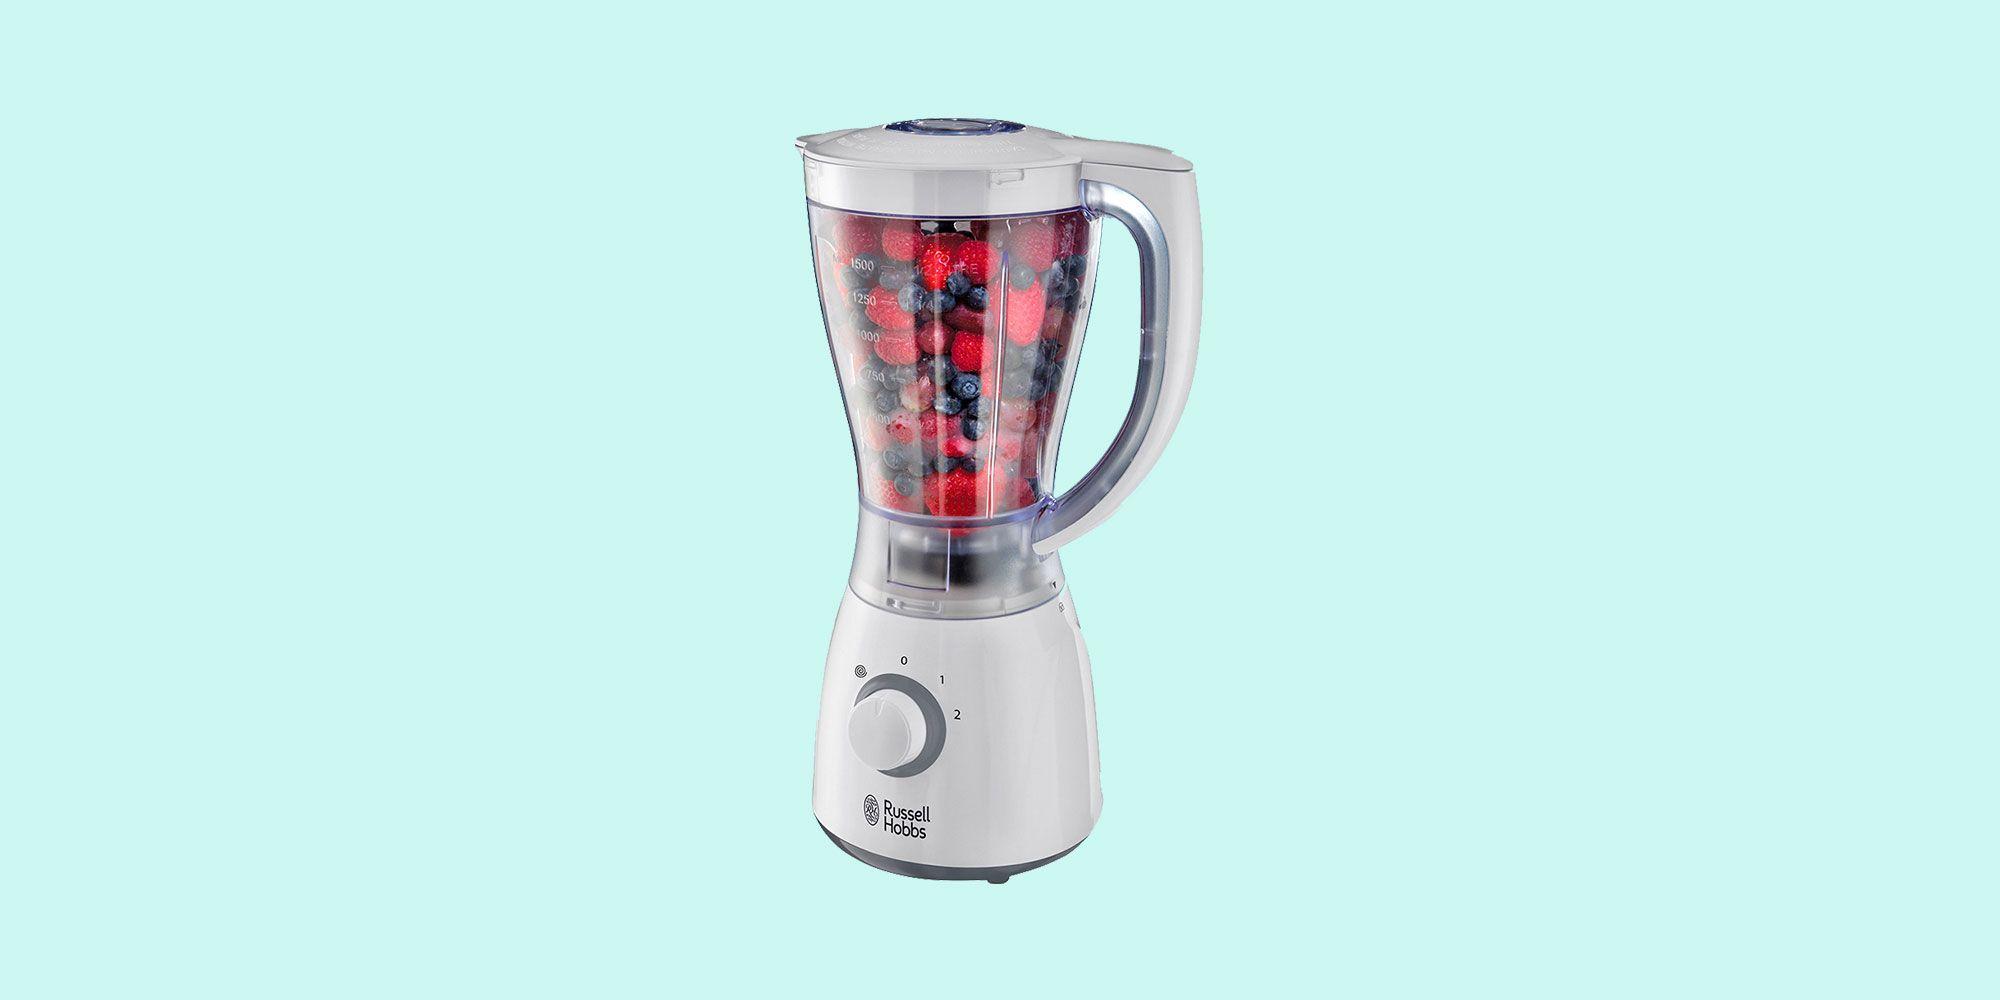 1.5L 5 Speed Glass Jug Kitchen Blender